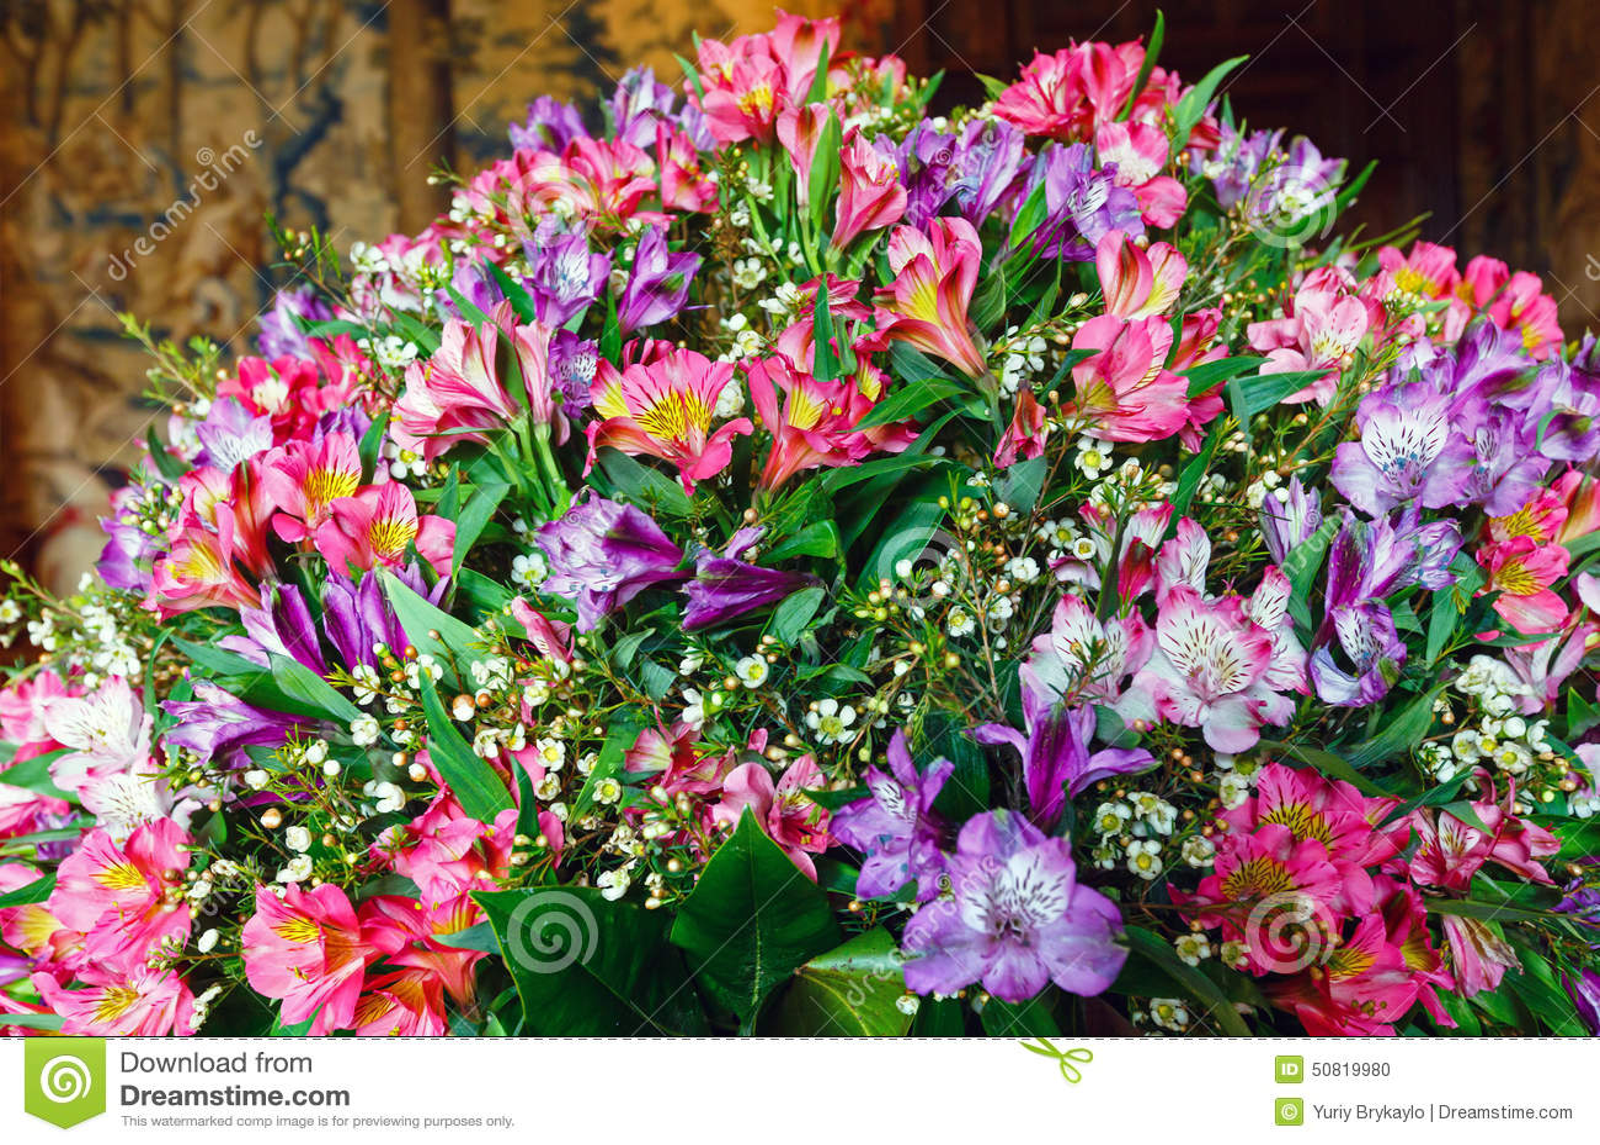 Big multicolor alstroemeria flowers bouquet stock photo for Big bouquets of flowers